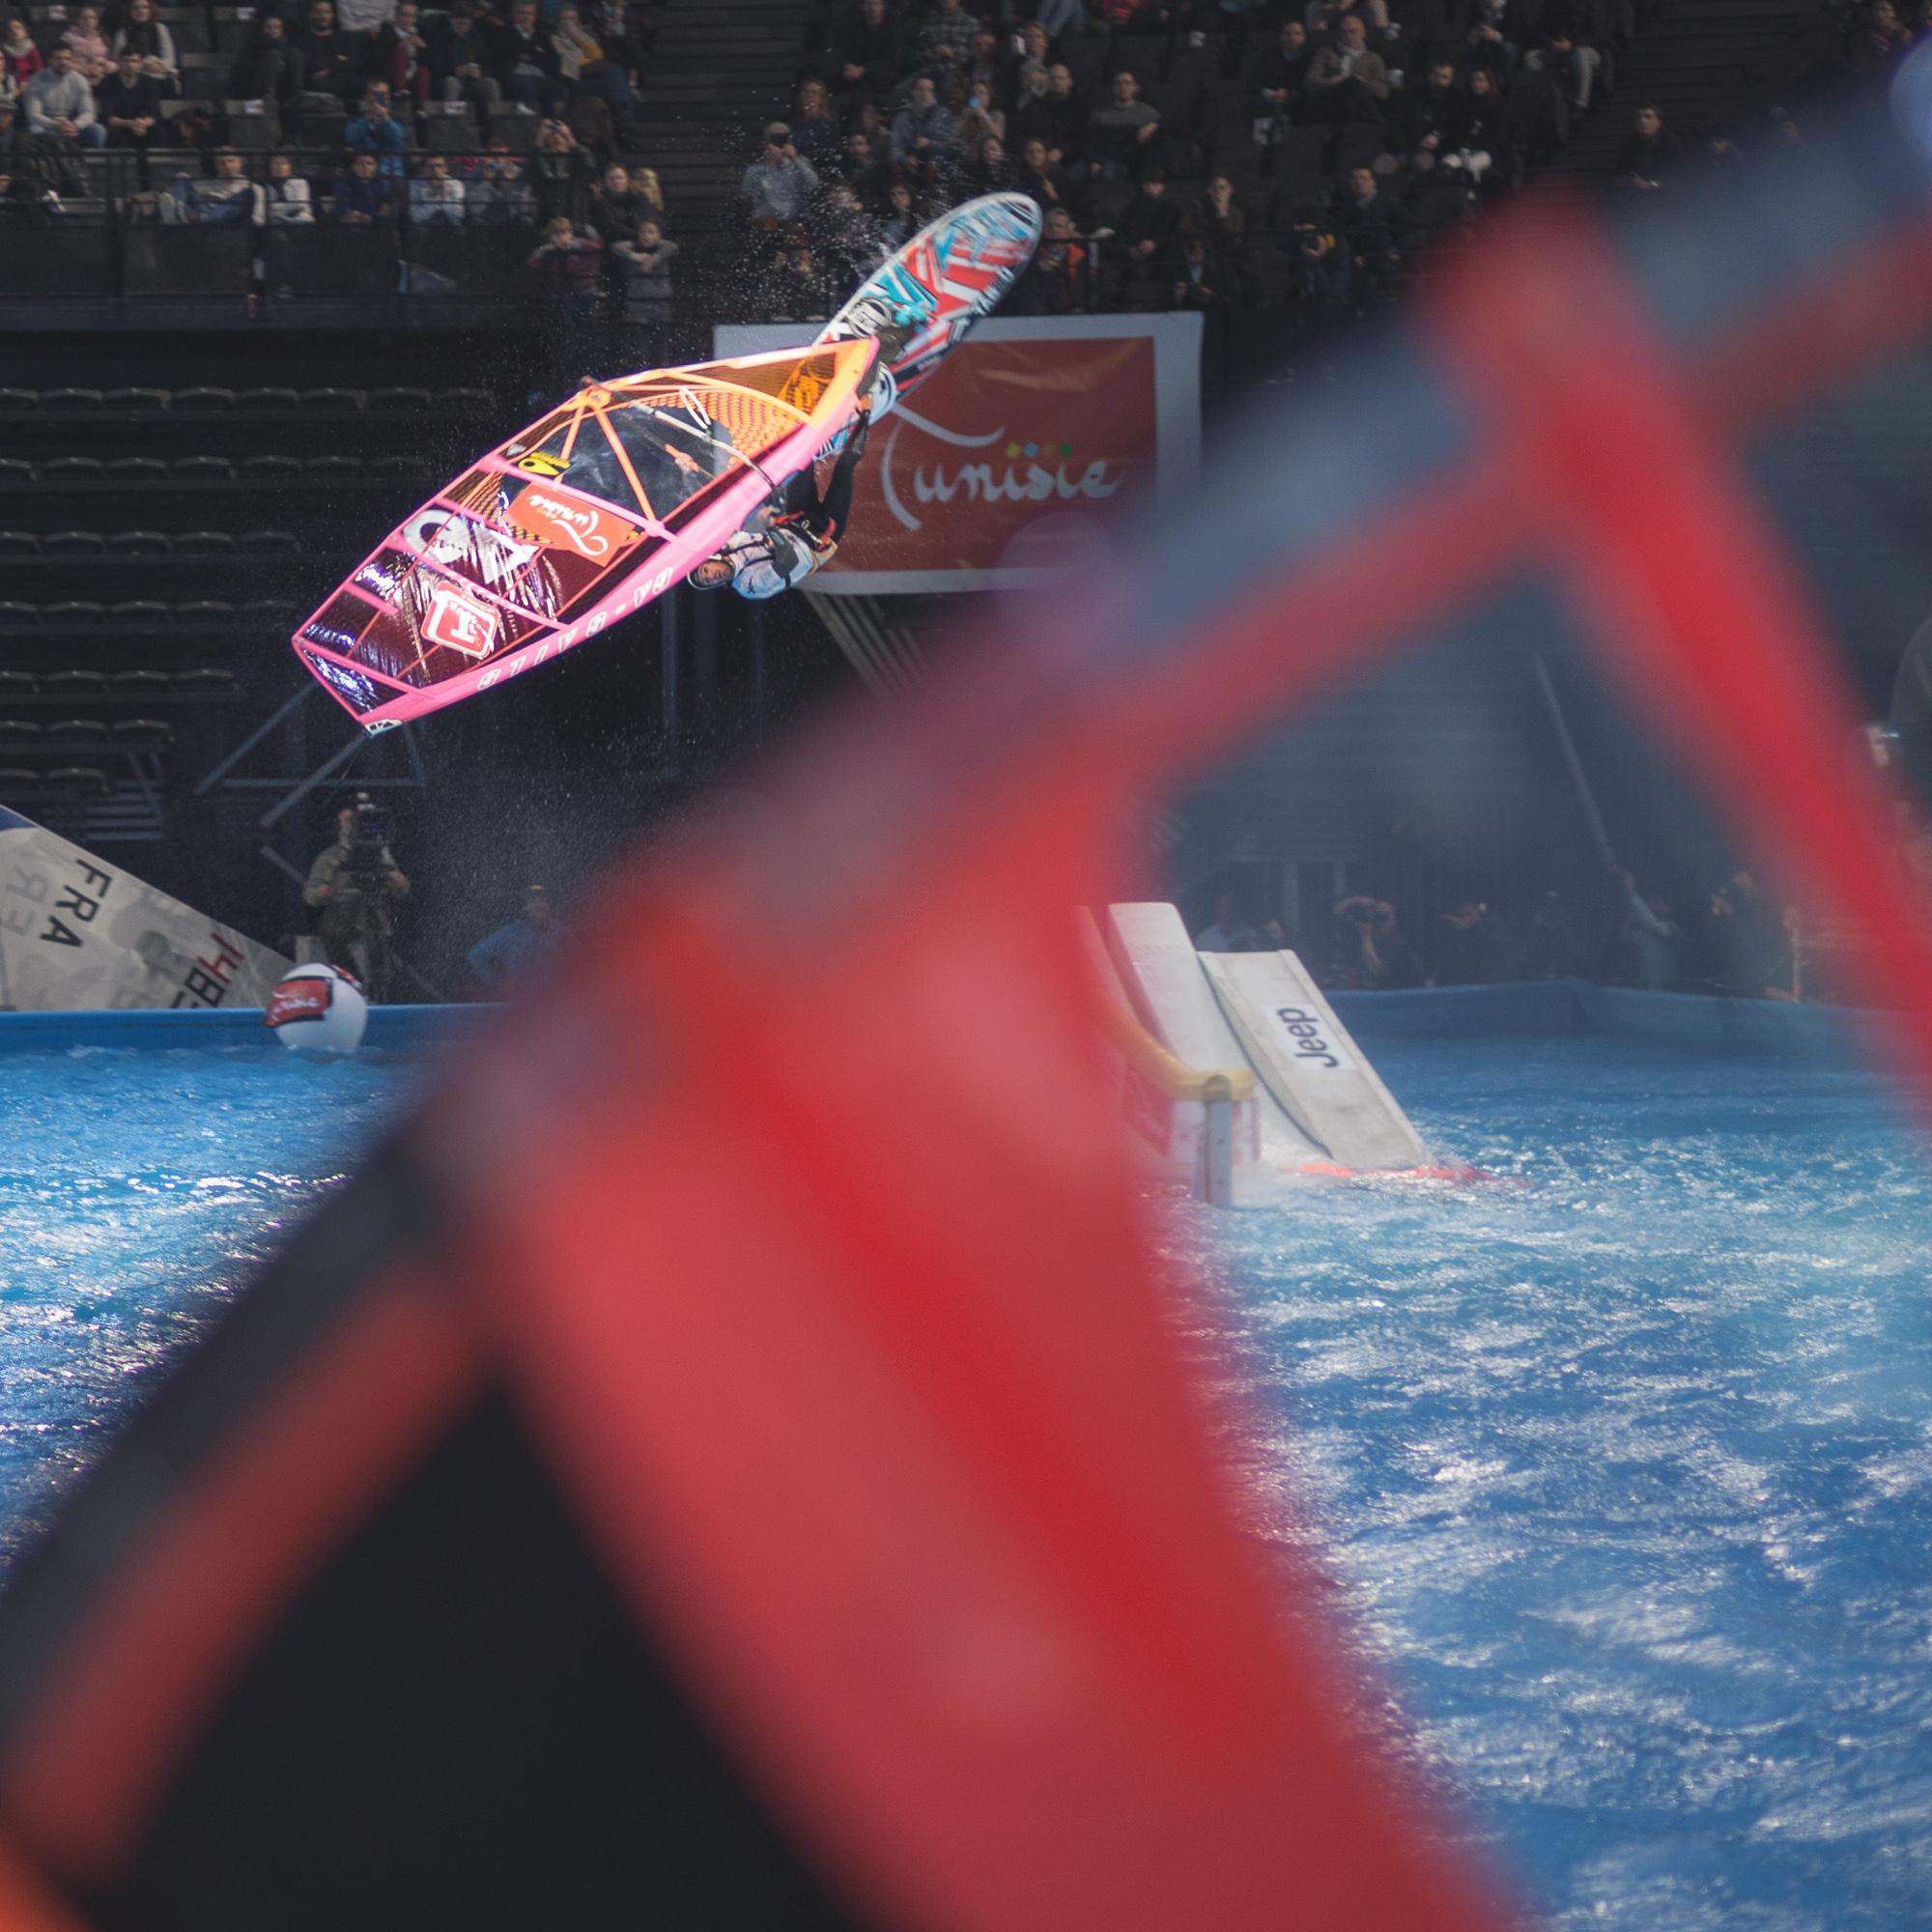 Indoor-windsurf-9